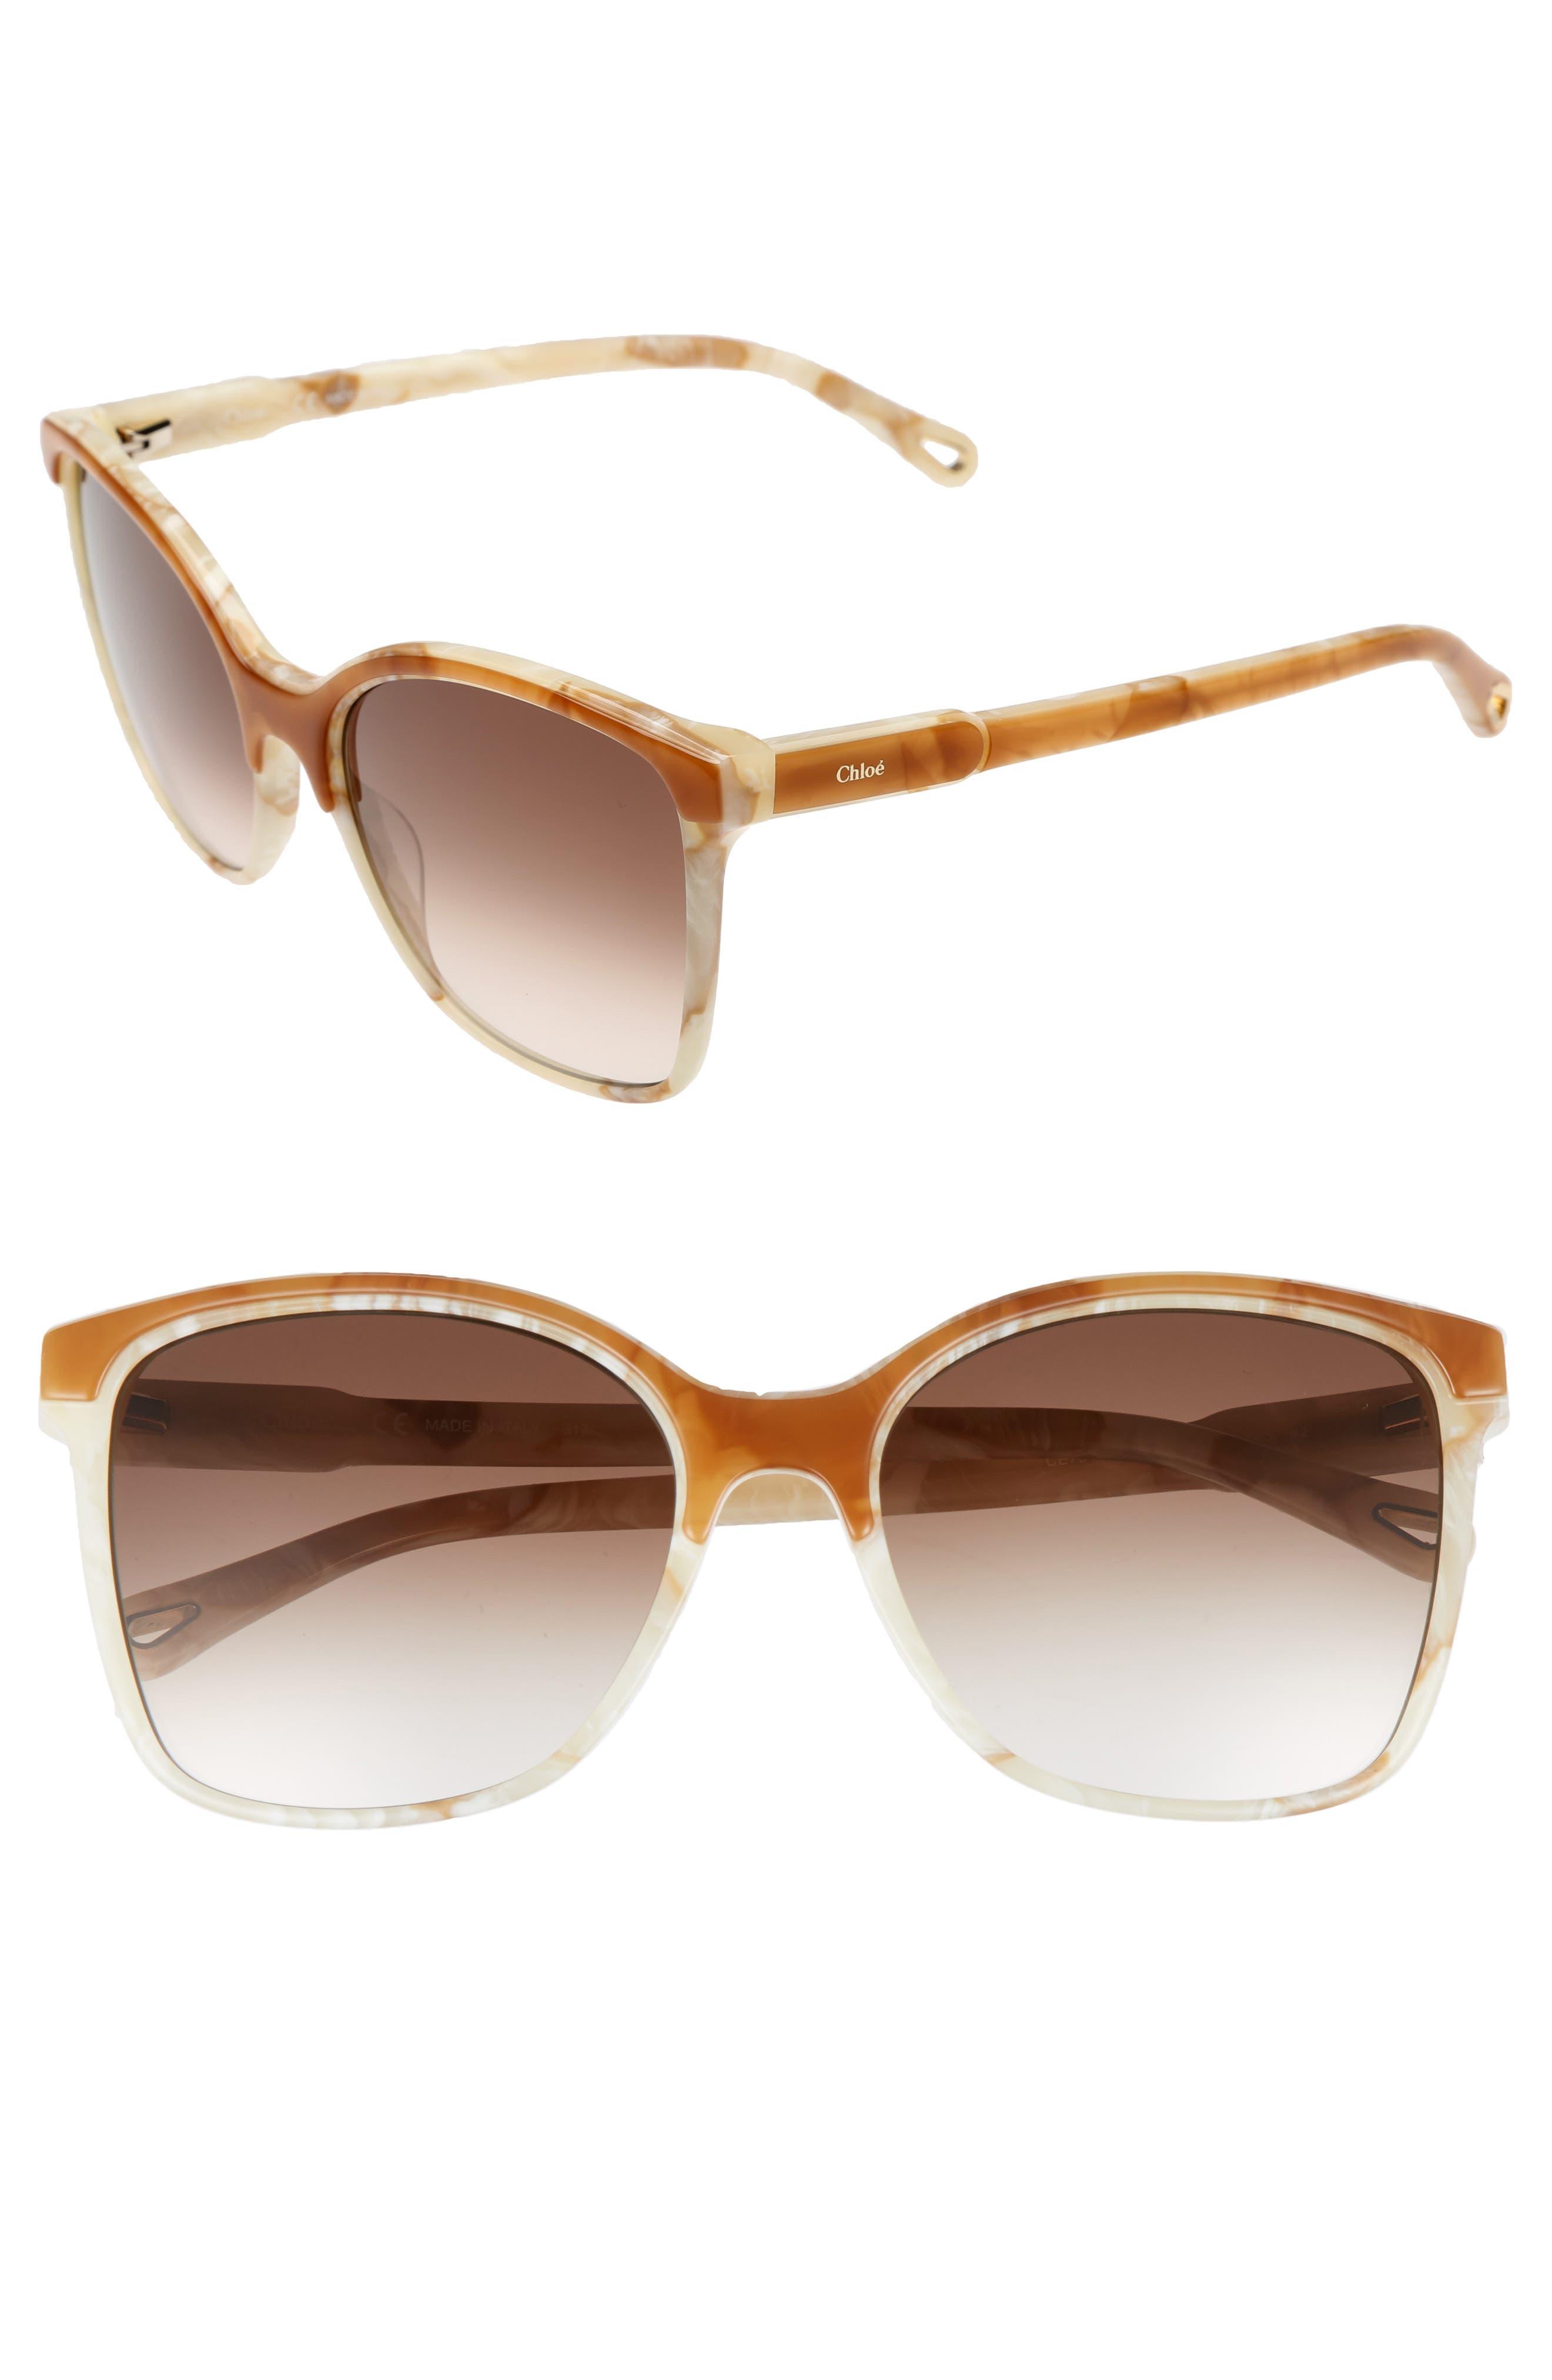 Alternate Image 1 Selected - Chloé 59mm Brow Bar Sunglasses